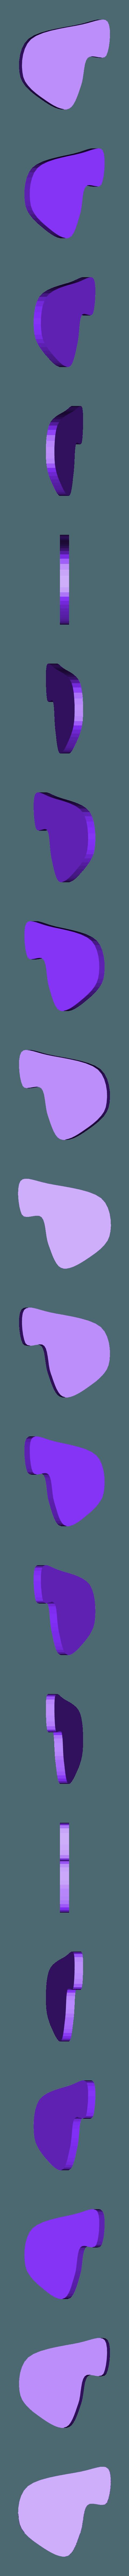 socle-mewtwo.stl Download STL file Mewtwo • 3D printable model, Hawo